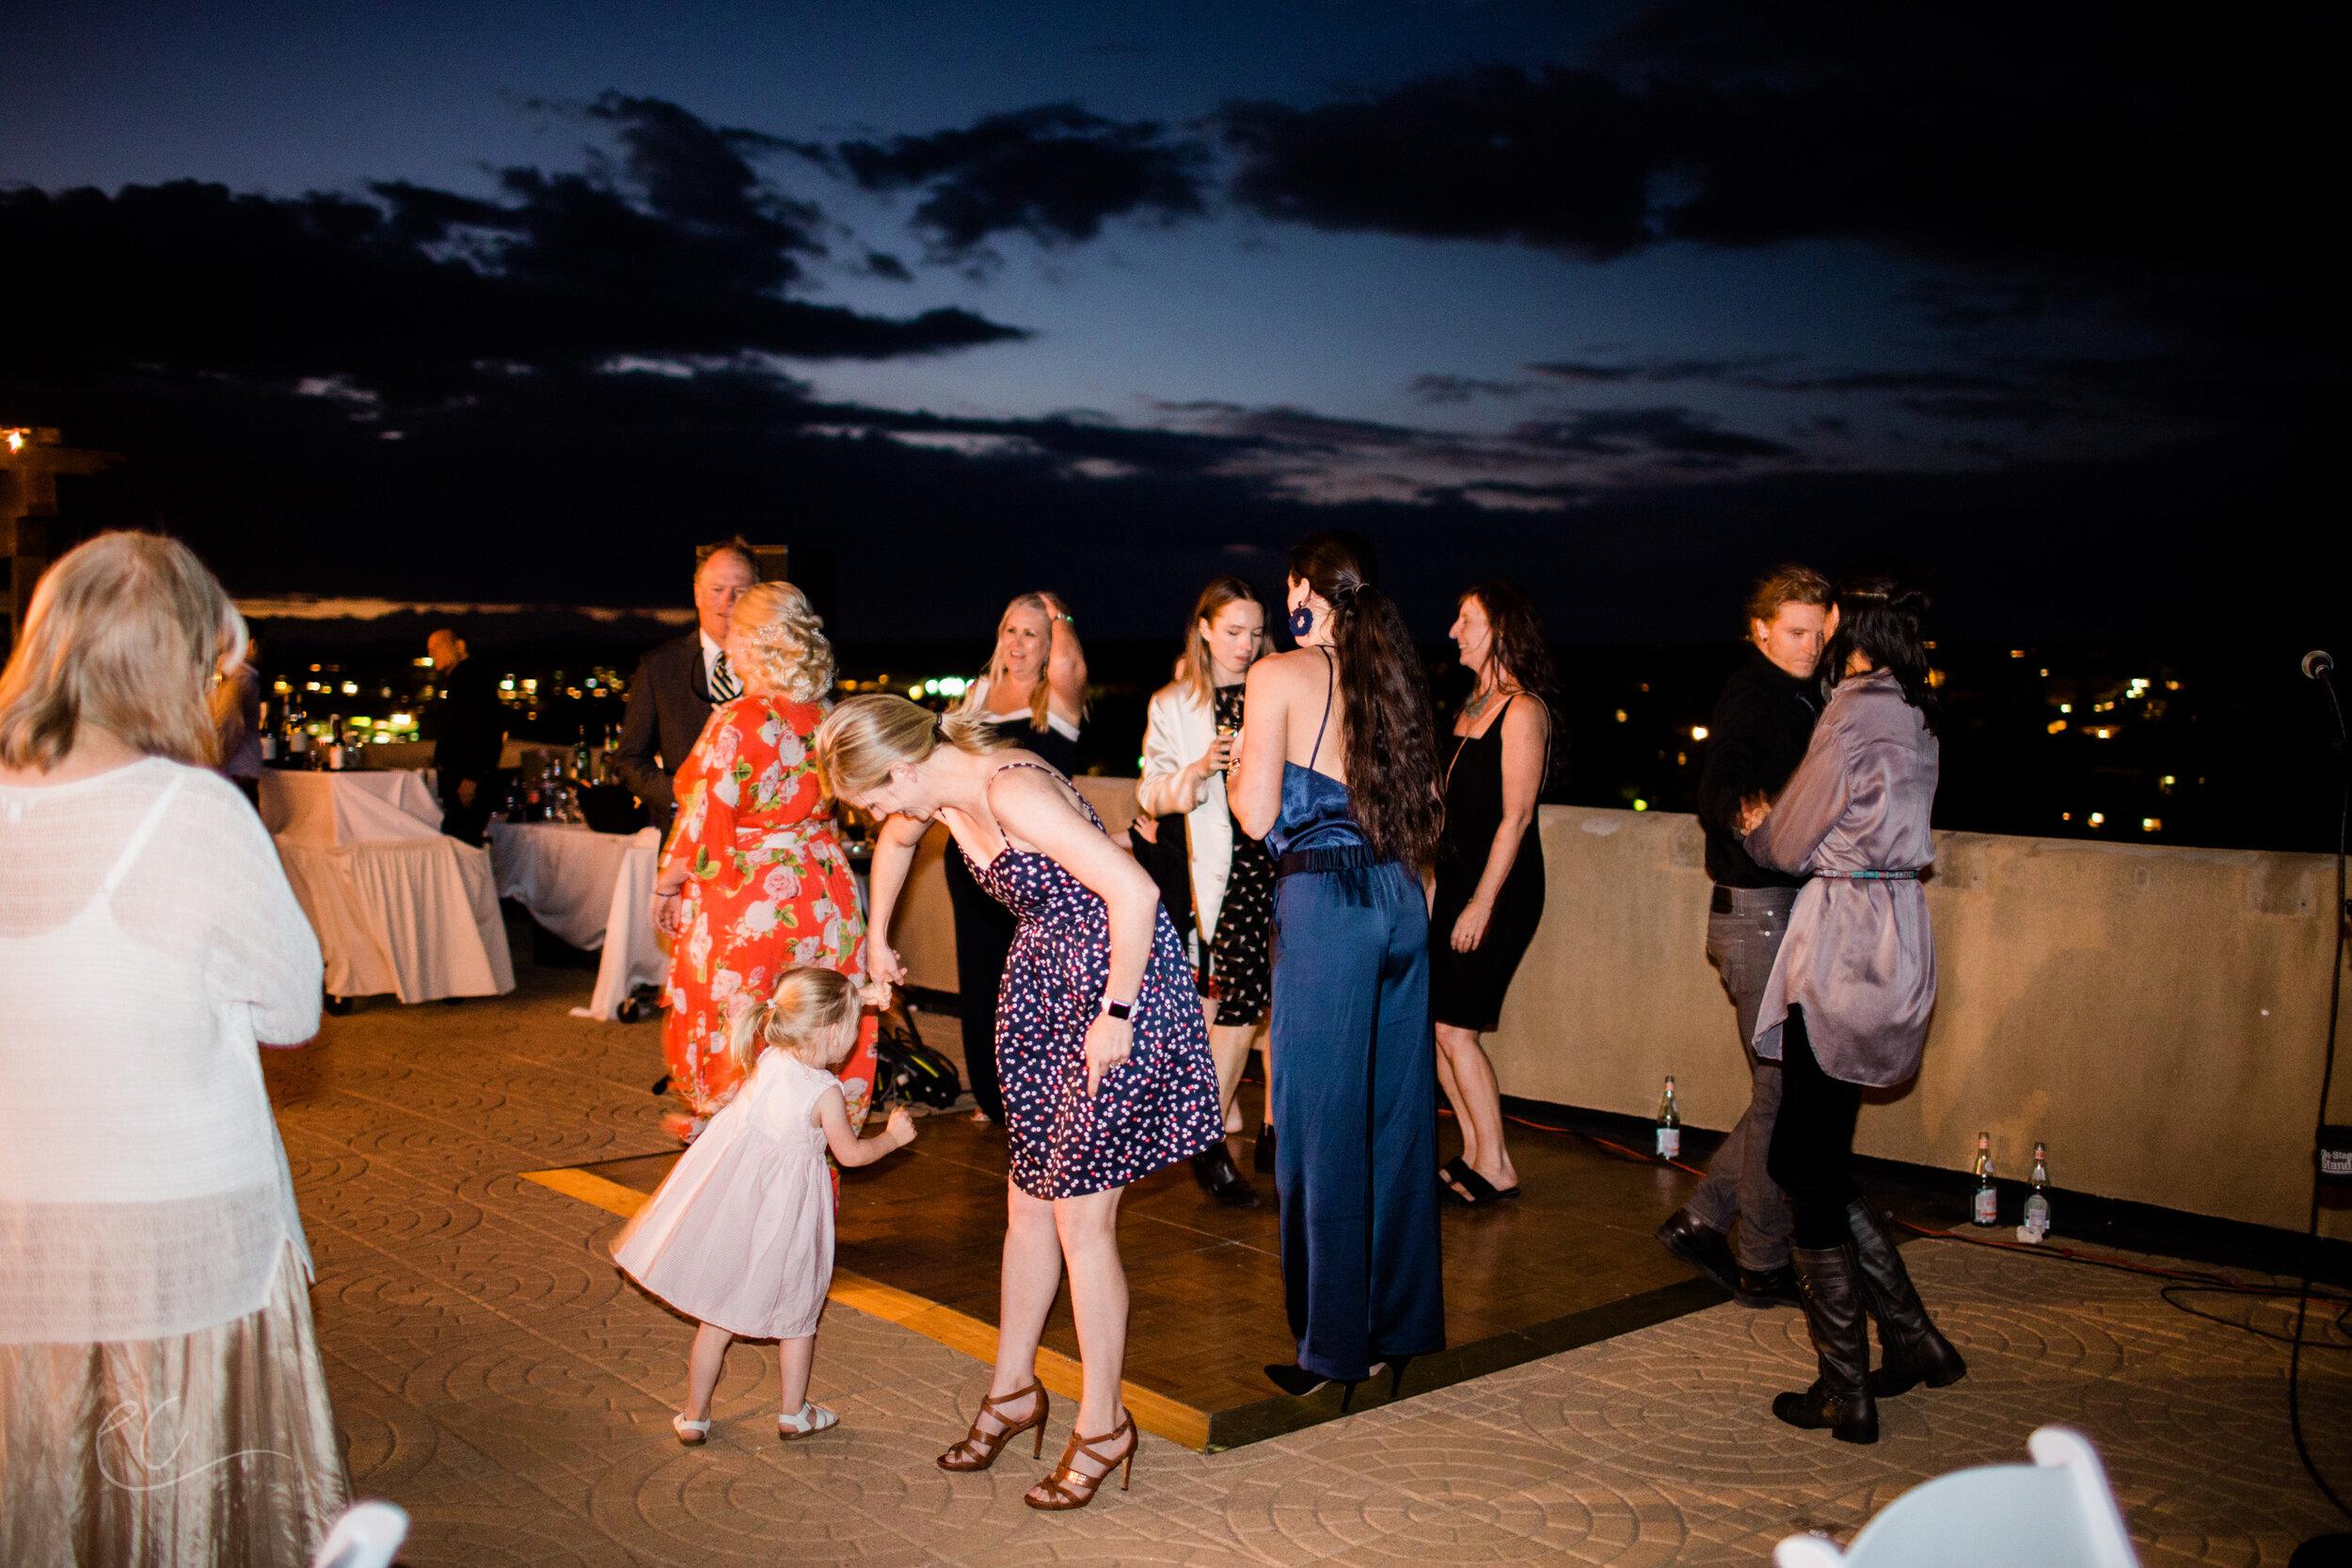 Santafe_wedding_photography_kellyzac-99.jpg